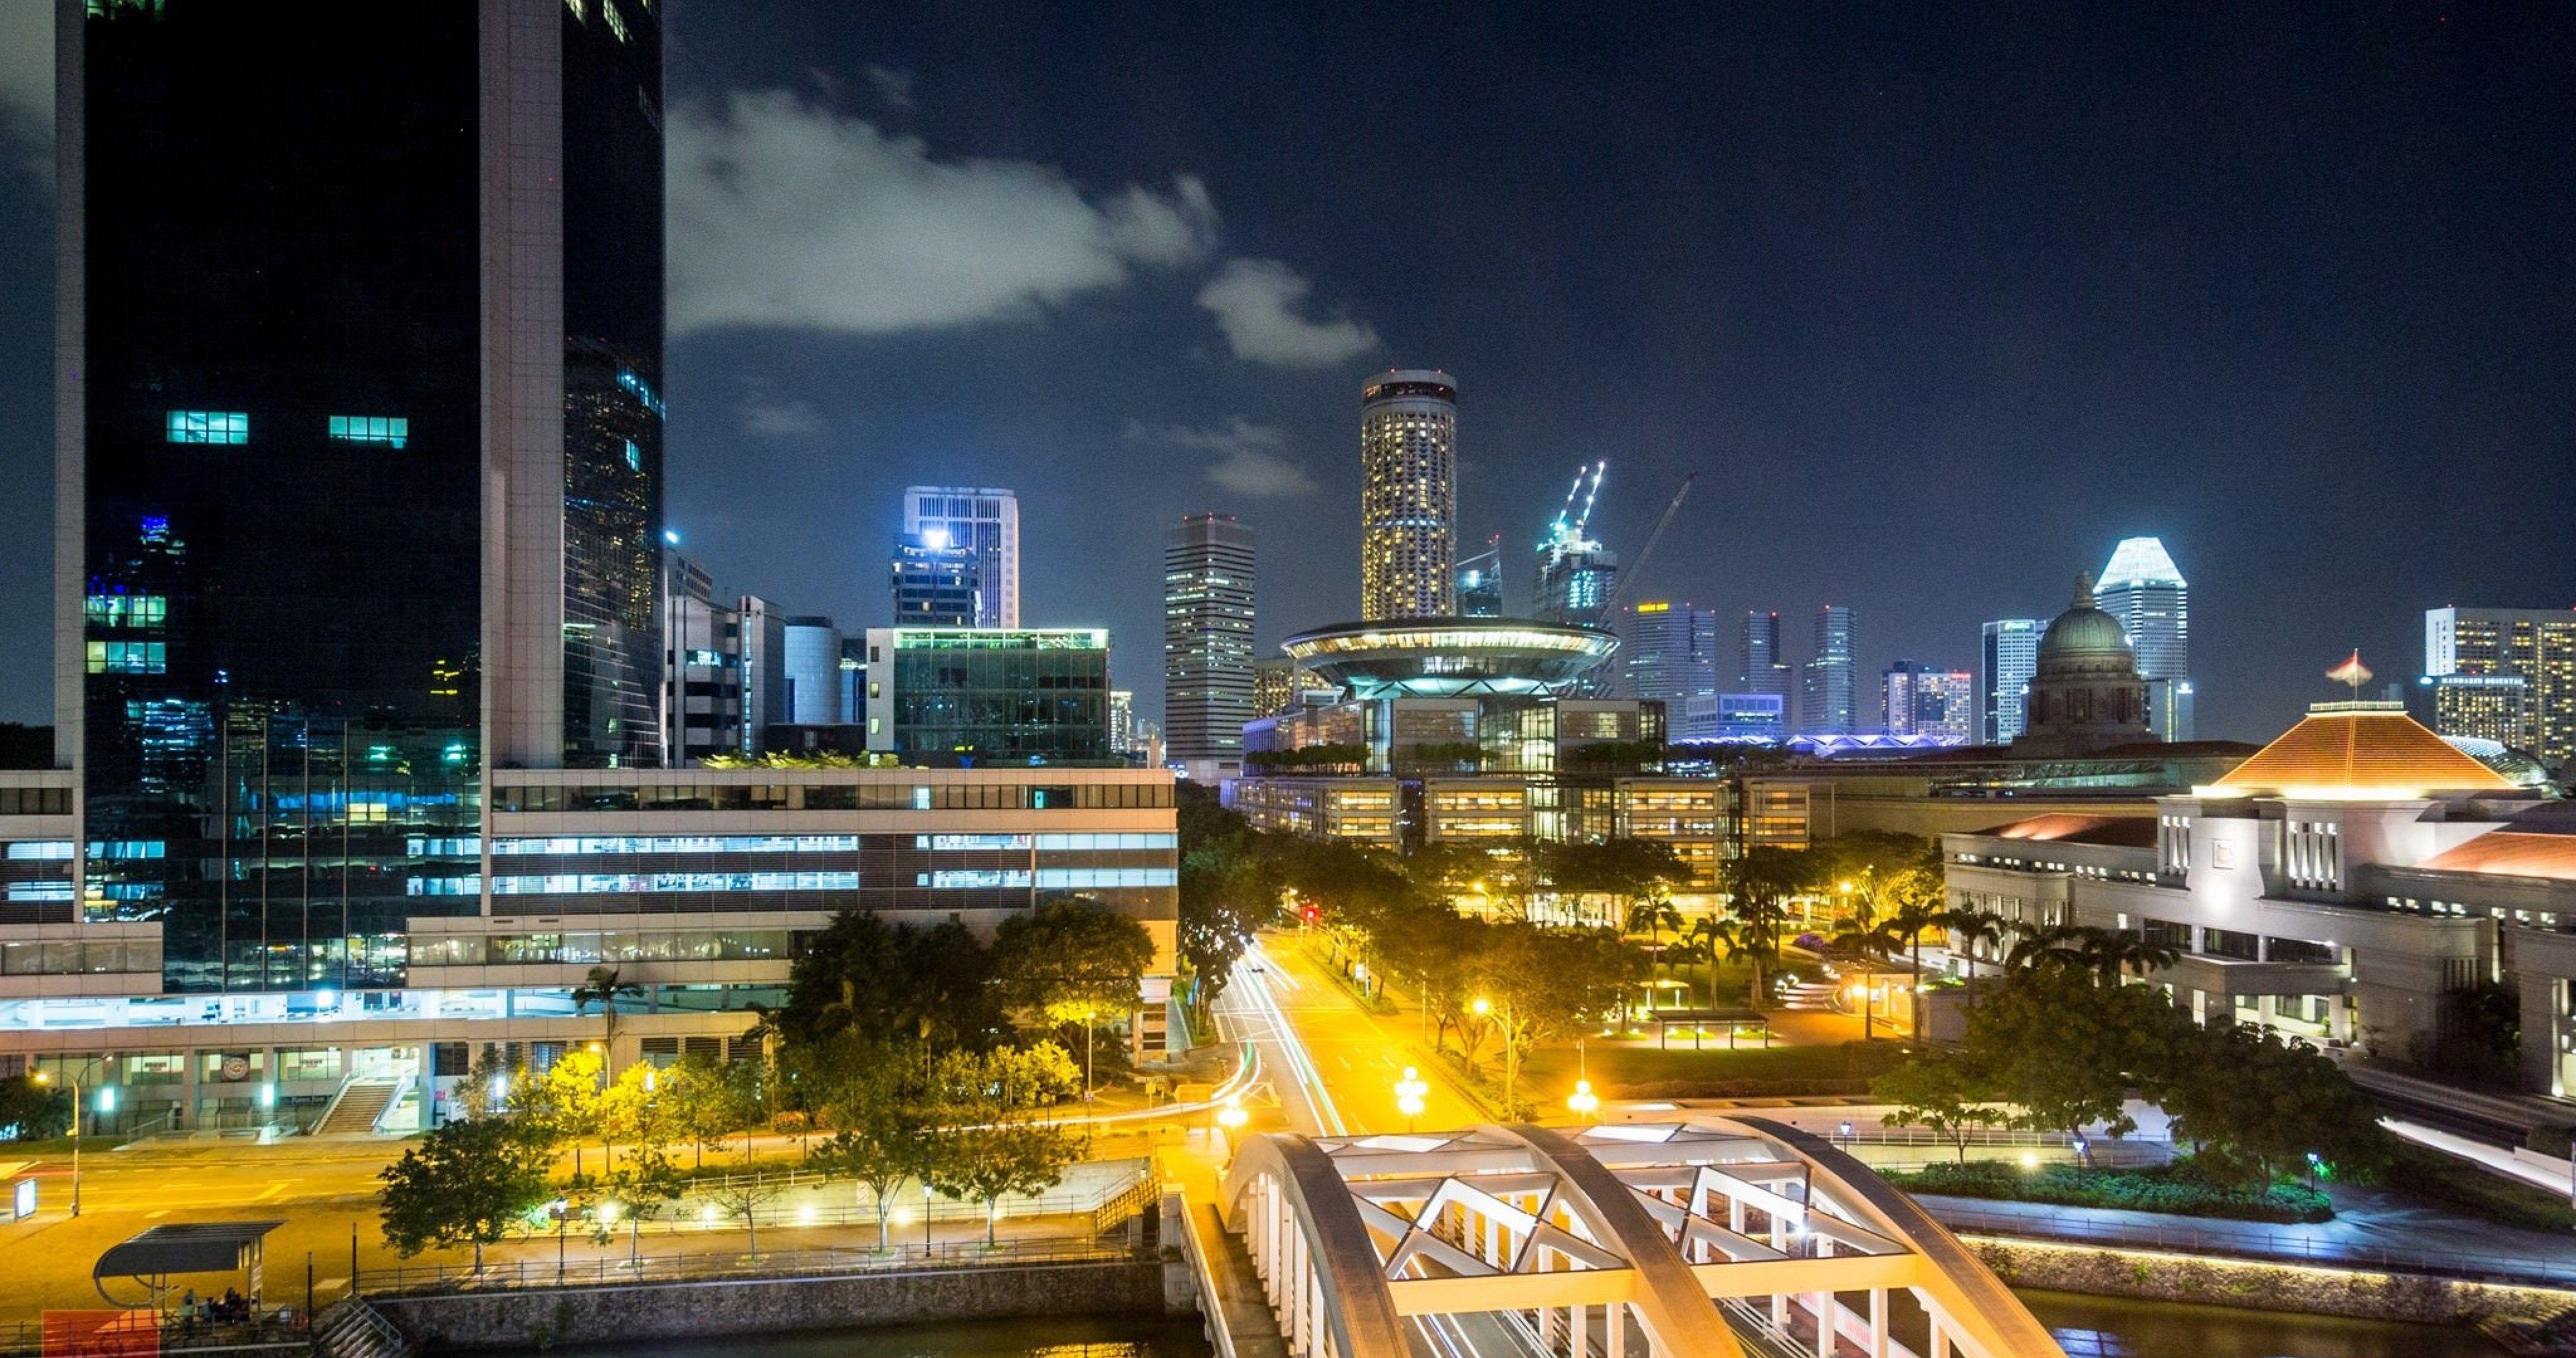 river crossing singapure 4k ultra hd wallpaper